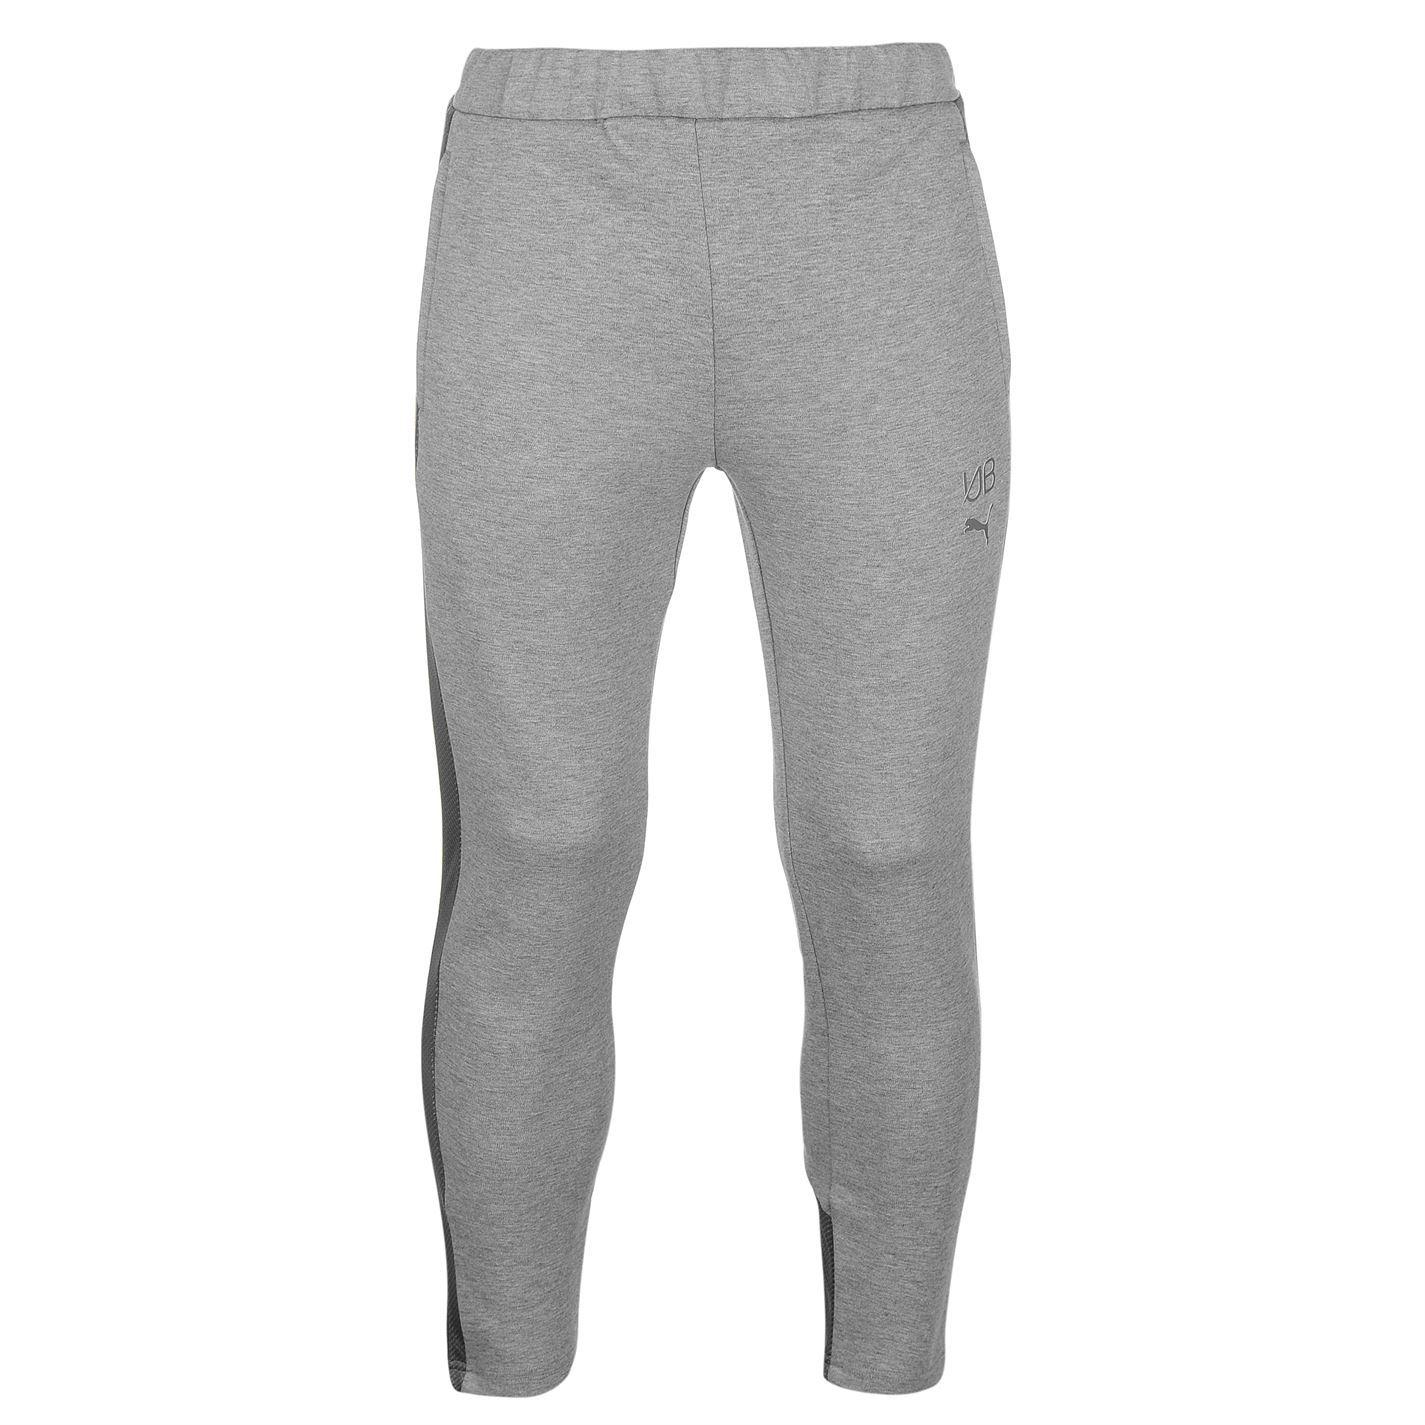 a3bbfdcf8b7f PUMA Mens Gents Usain Bolt Tracksuit Bottoms ZIPPED Clothing Grey XL ...